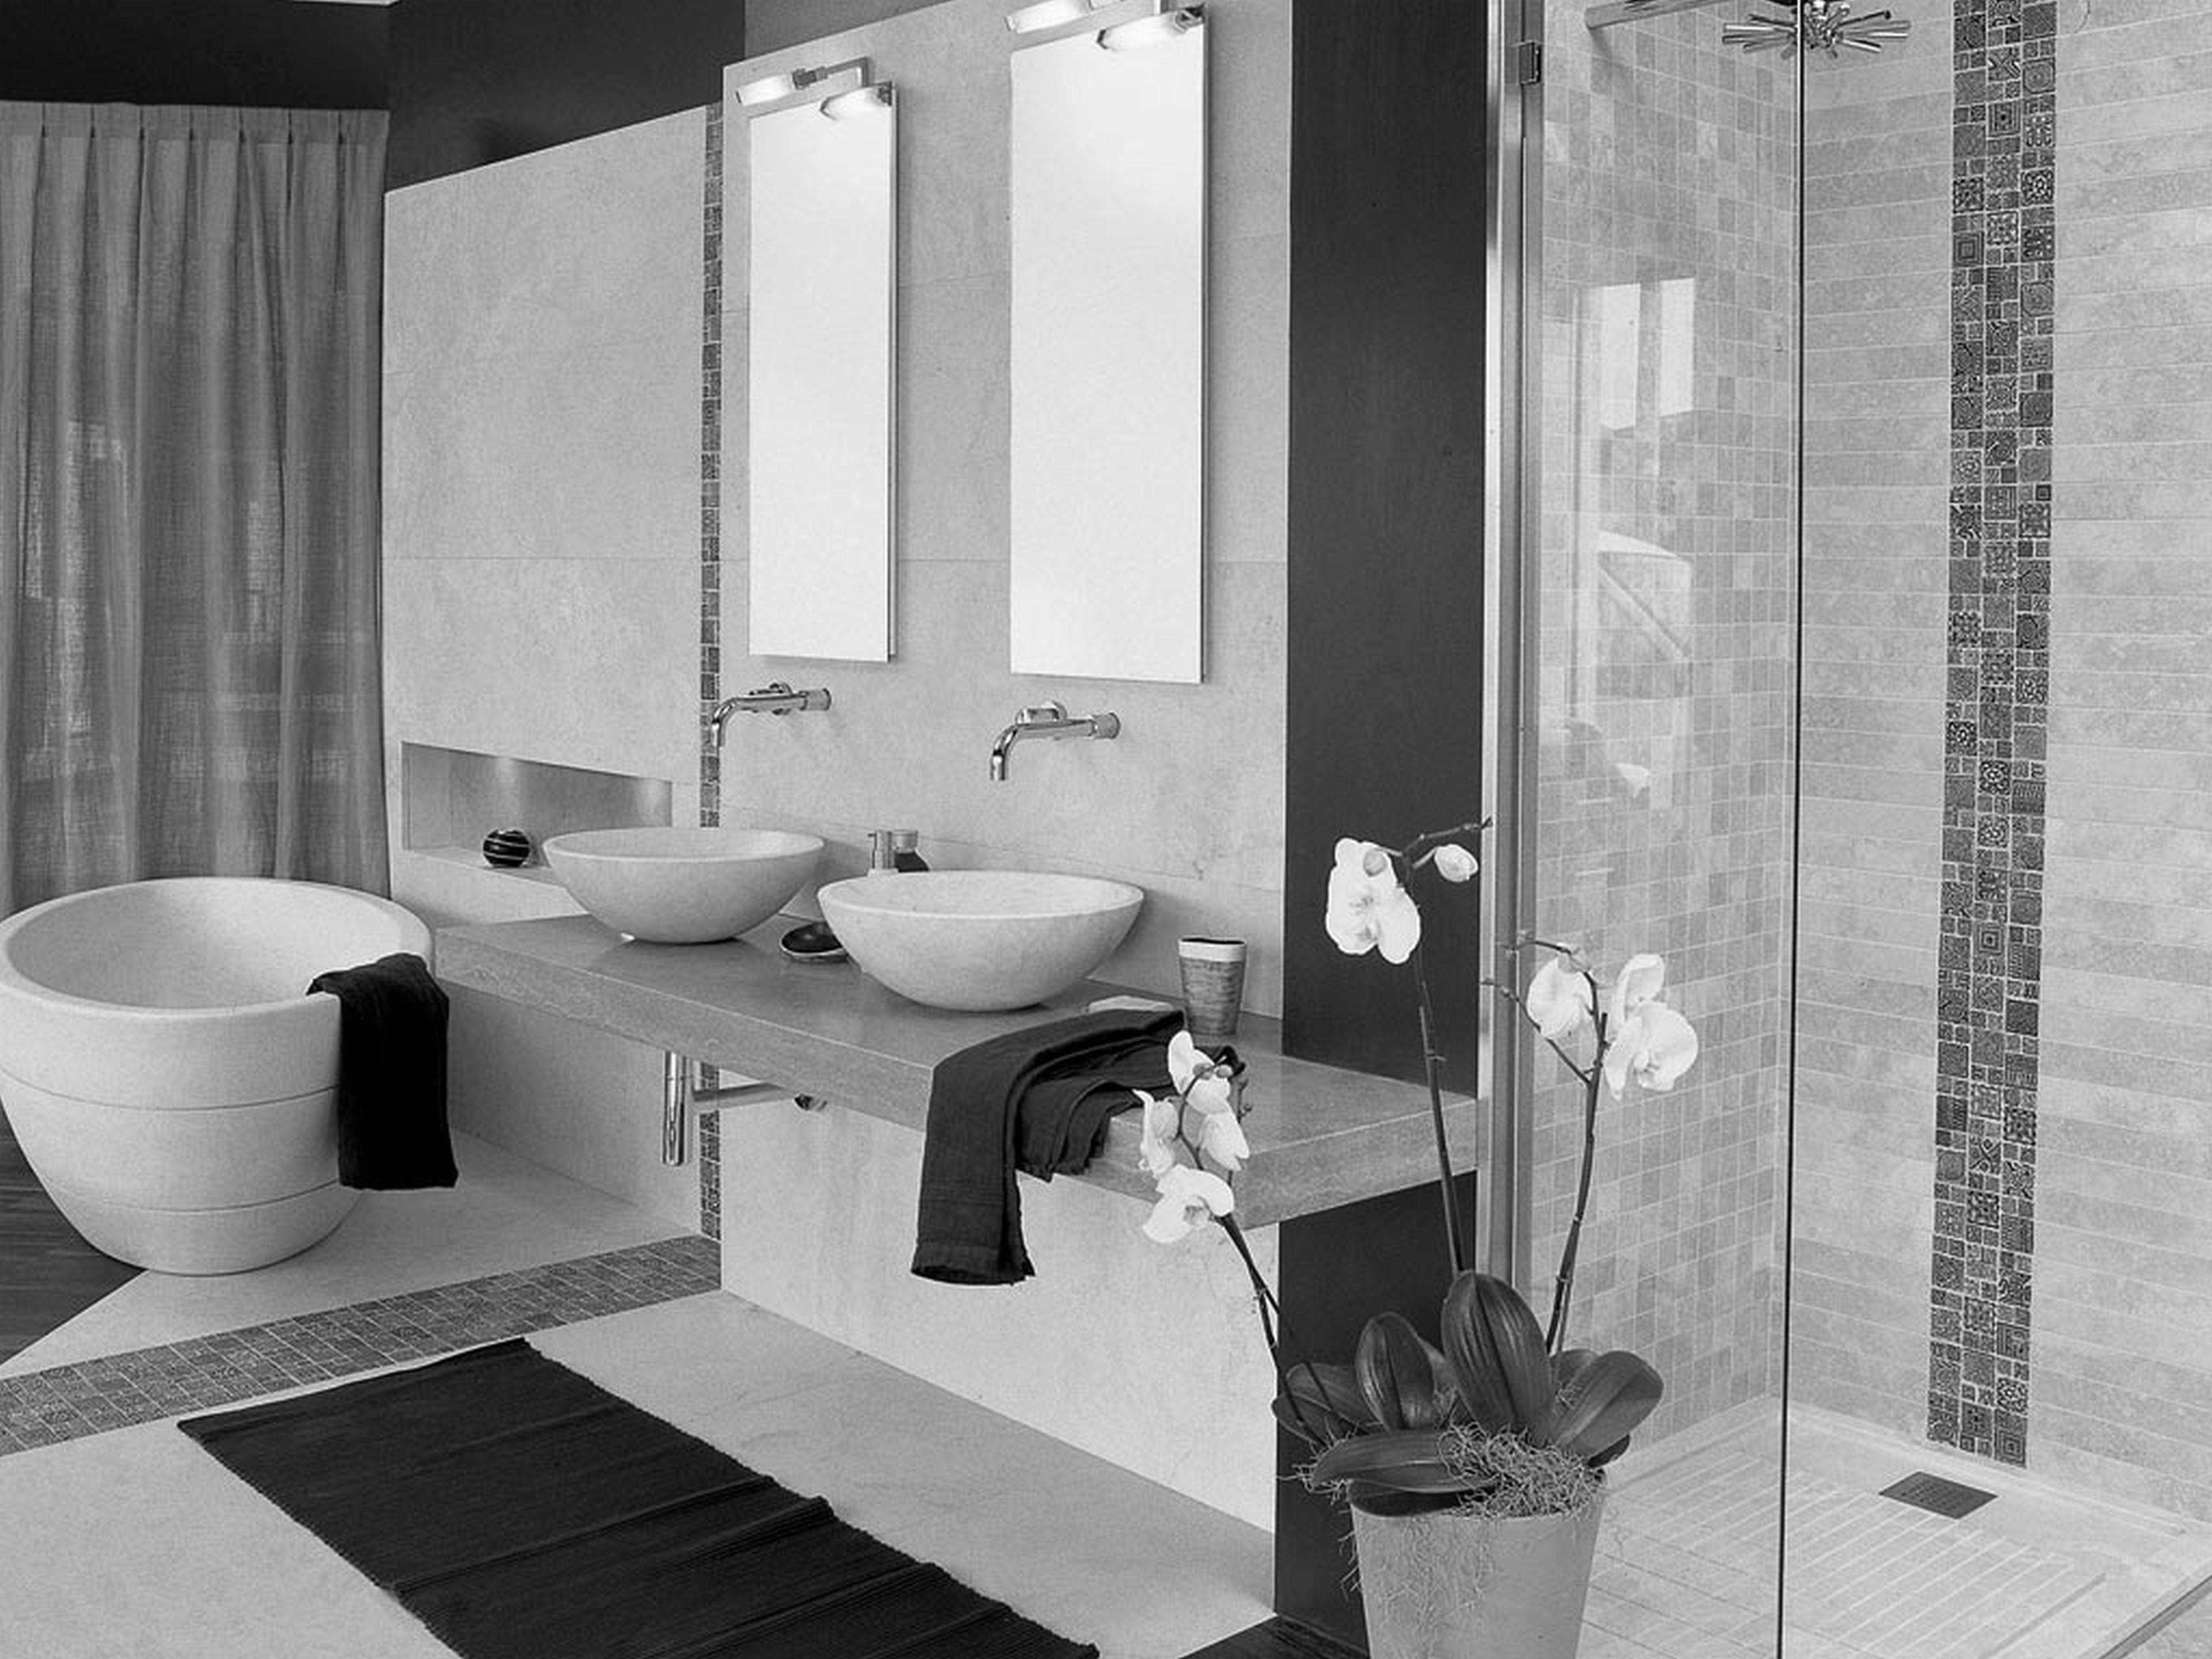 1 mln bathroom tile ideas home pinterest bathroom tiling 1 mln bathroom tile ideas dailygadgetfo Images